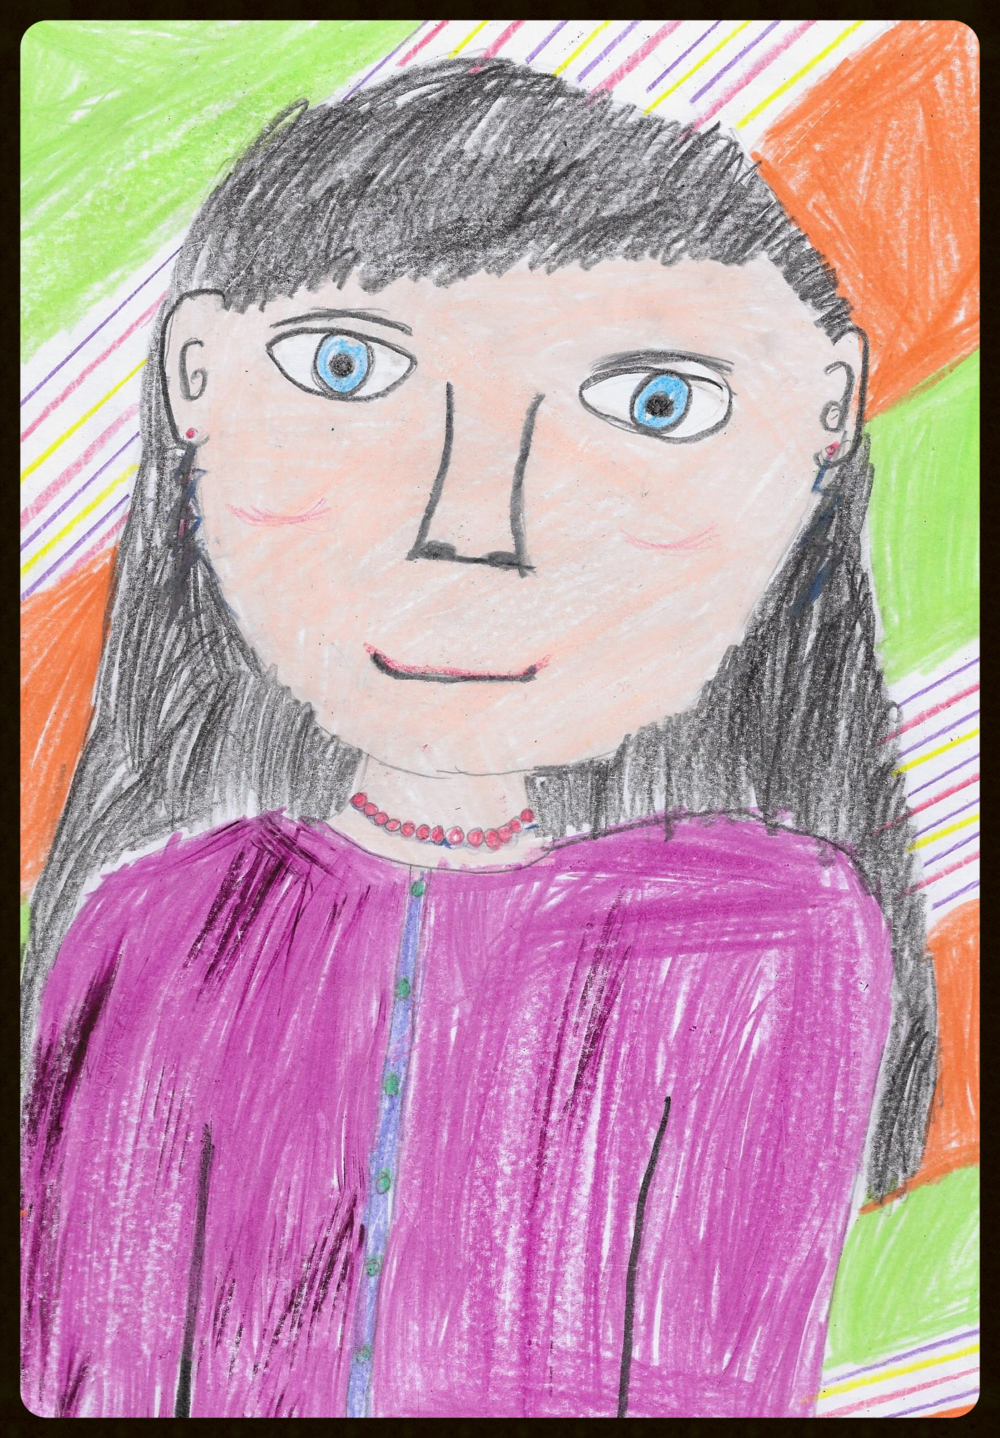 Ms. B O'Donovan - School Principal